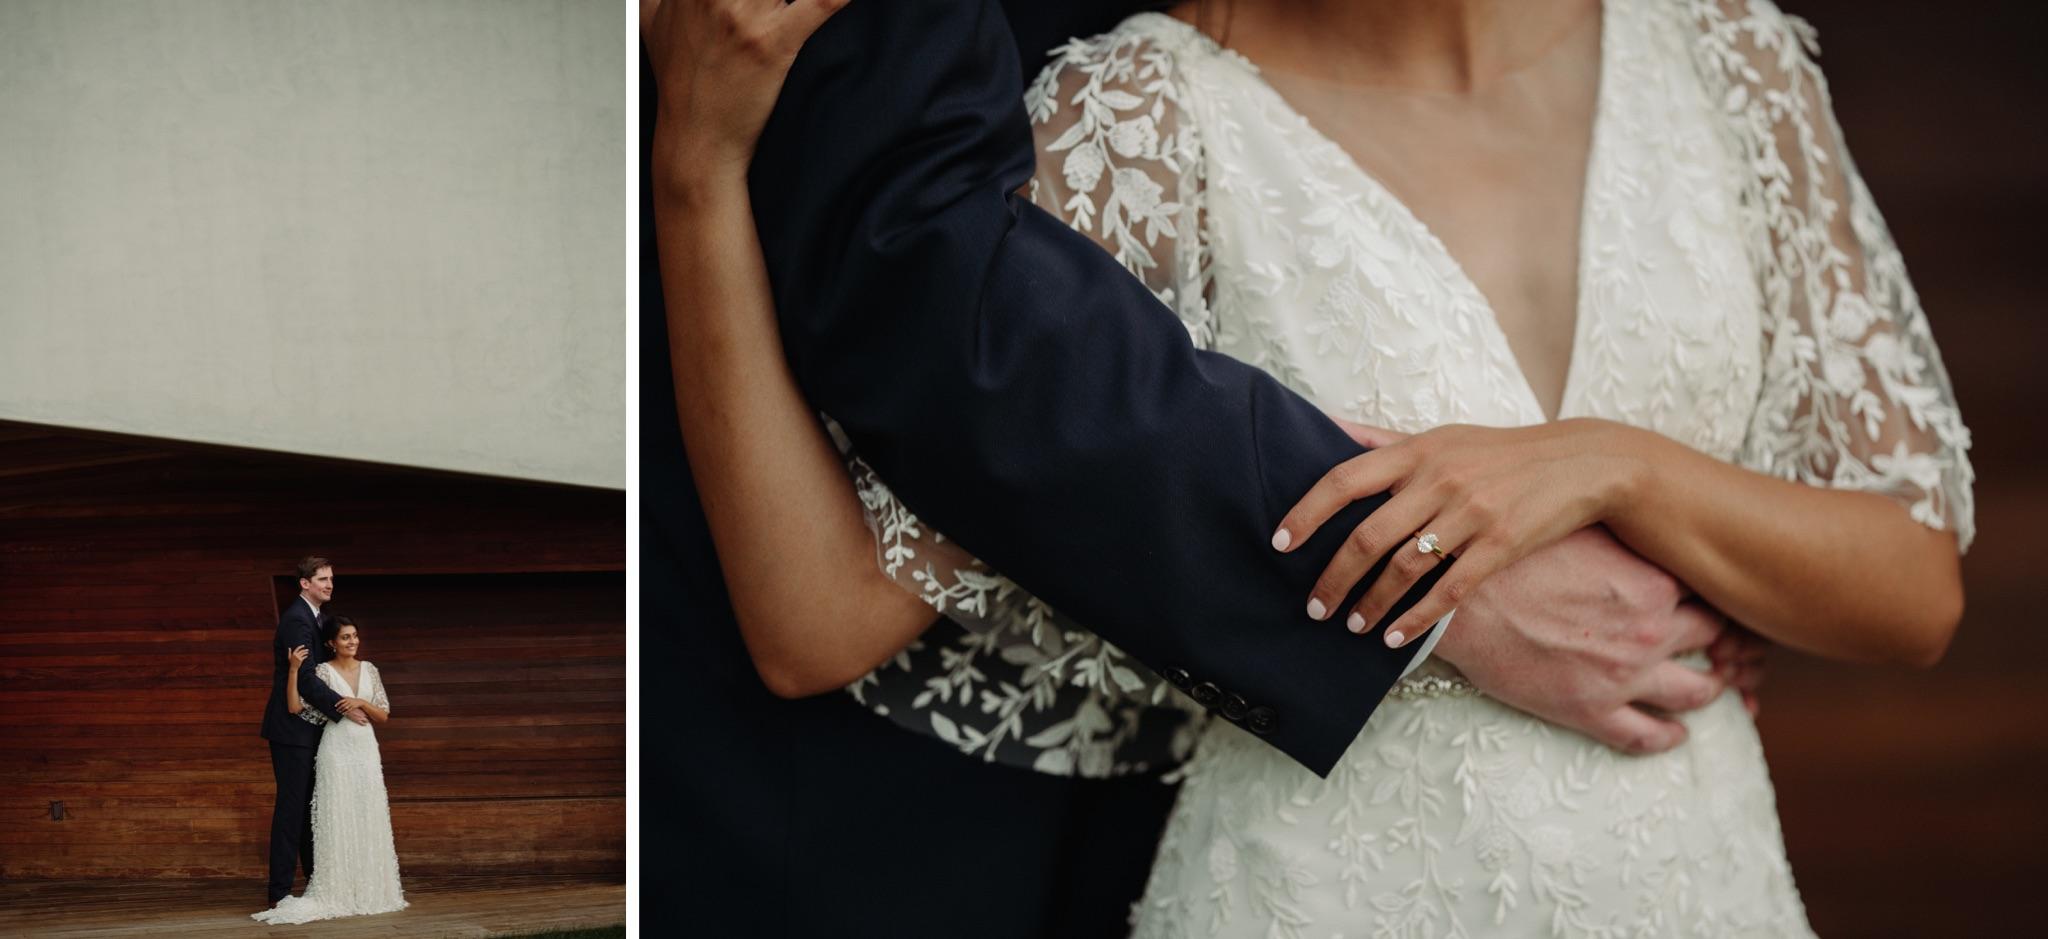 Bride holding groom's arm walker art center wedding